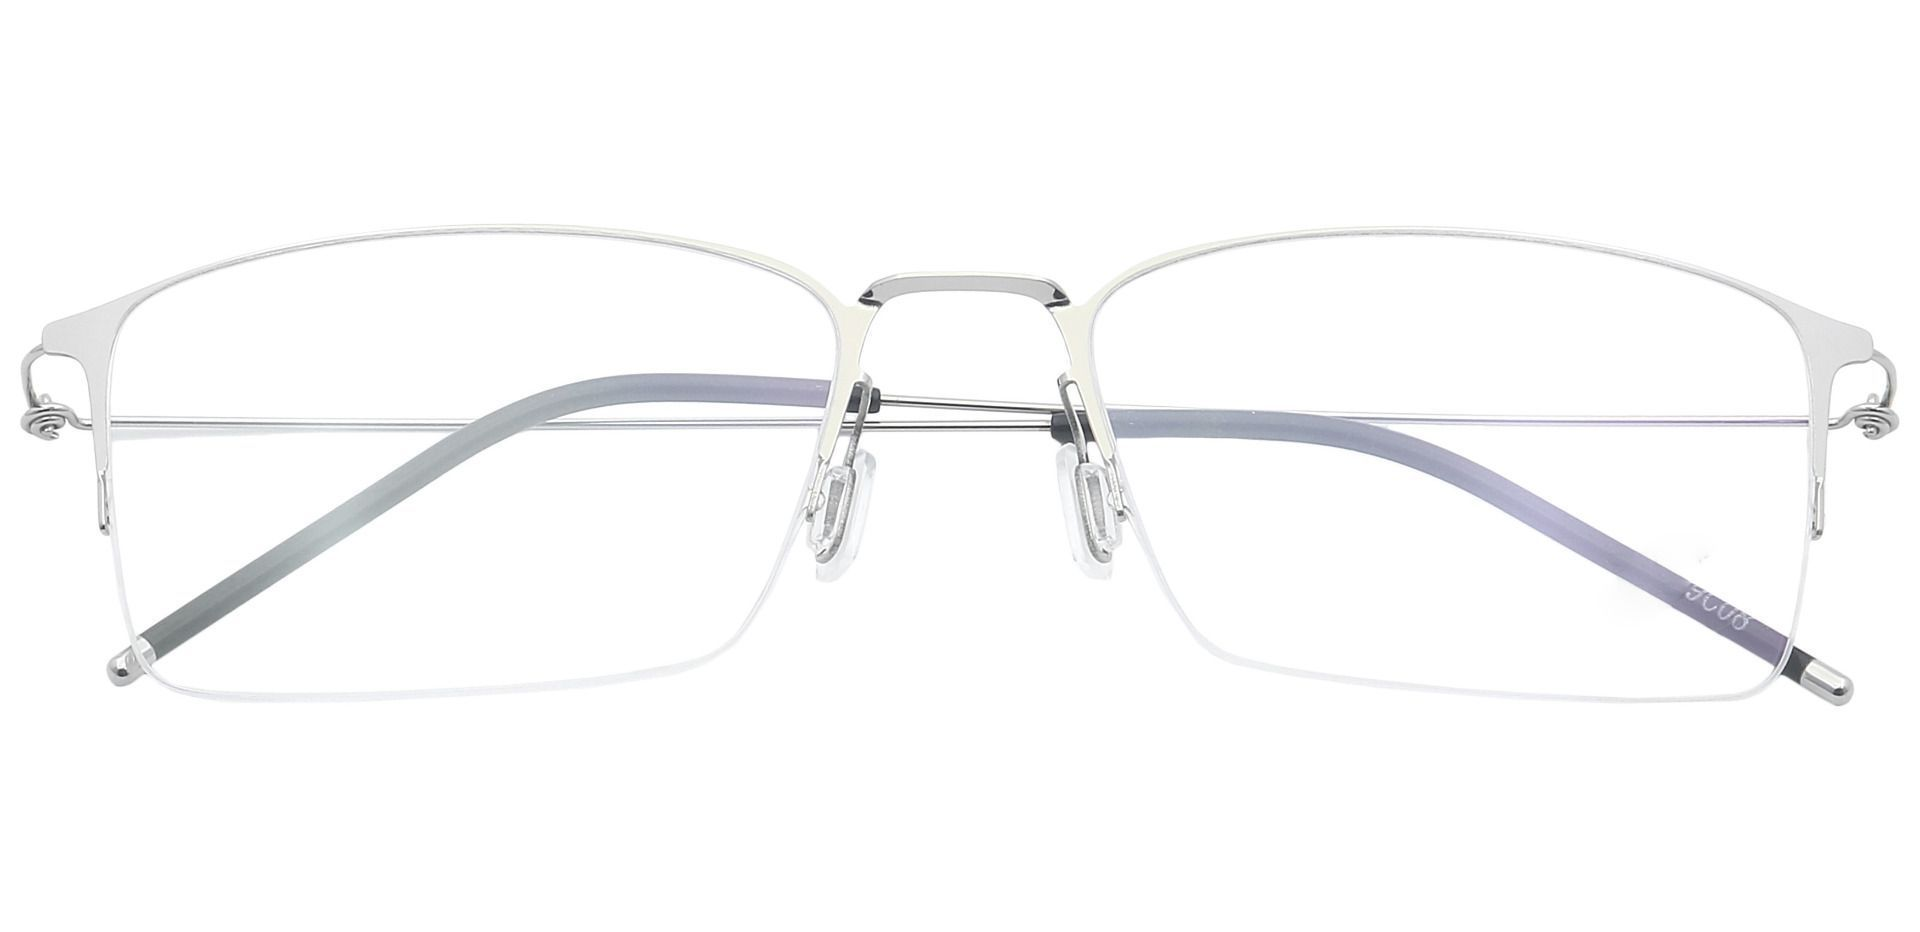 Rita Rectangle Blue Light Blocking Glasses - Clear